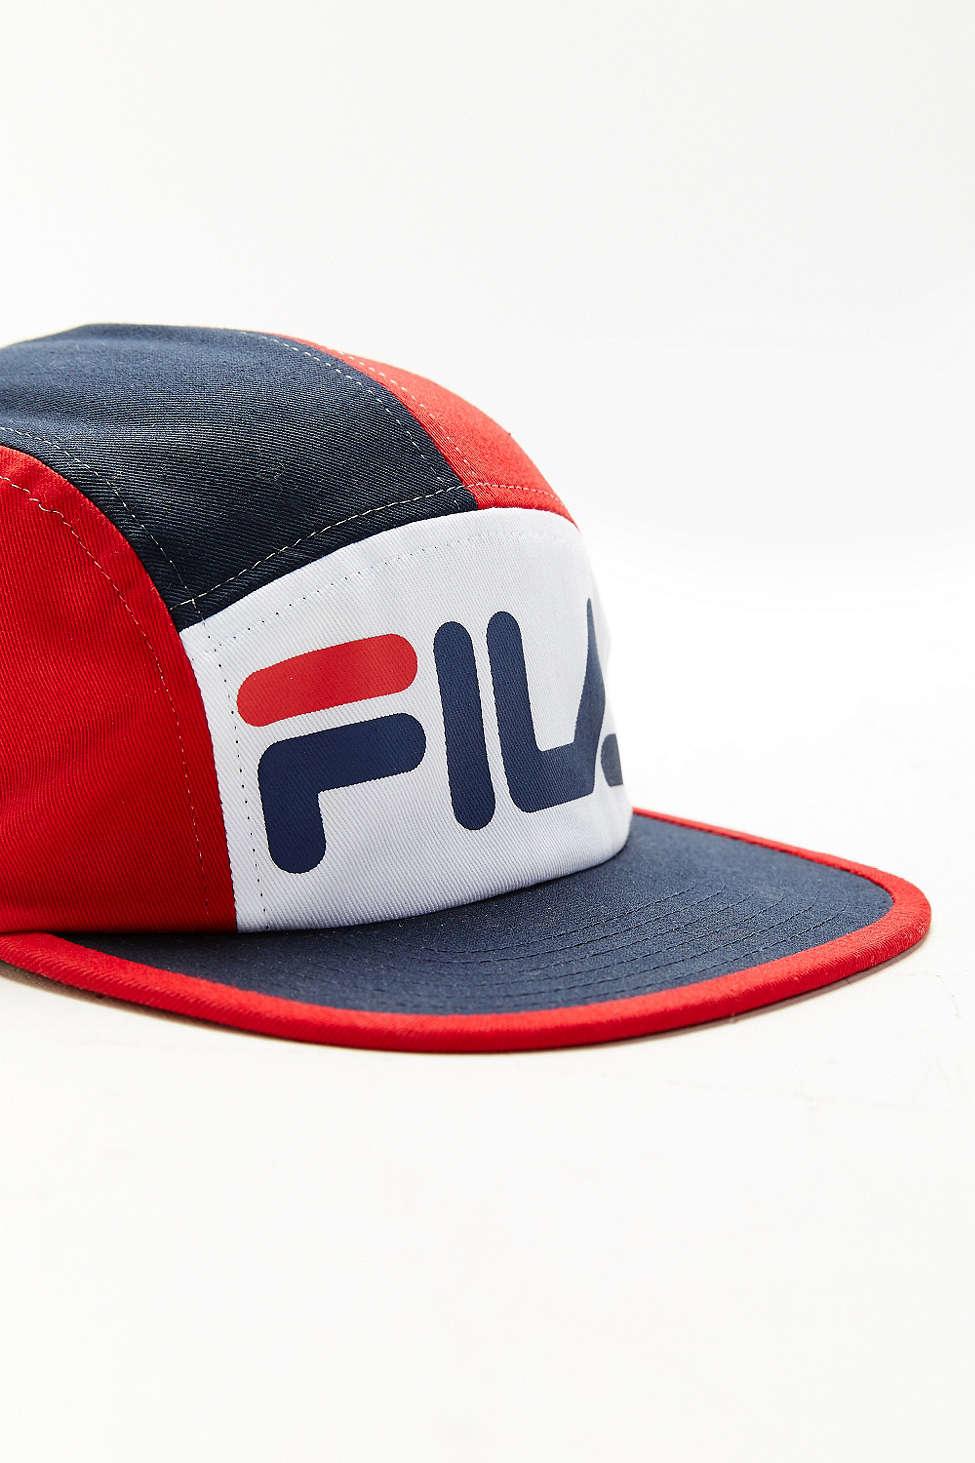 Lyst - Fila + Uo 5-panel Hat in Blue for Men 923e17442929